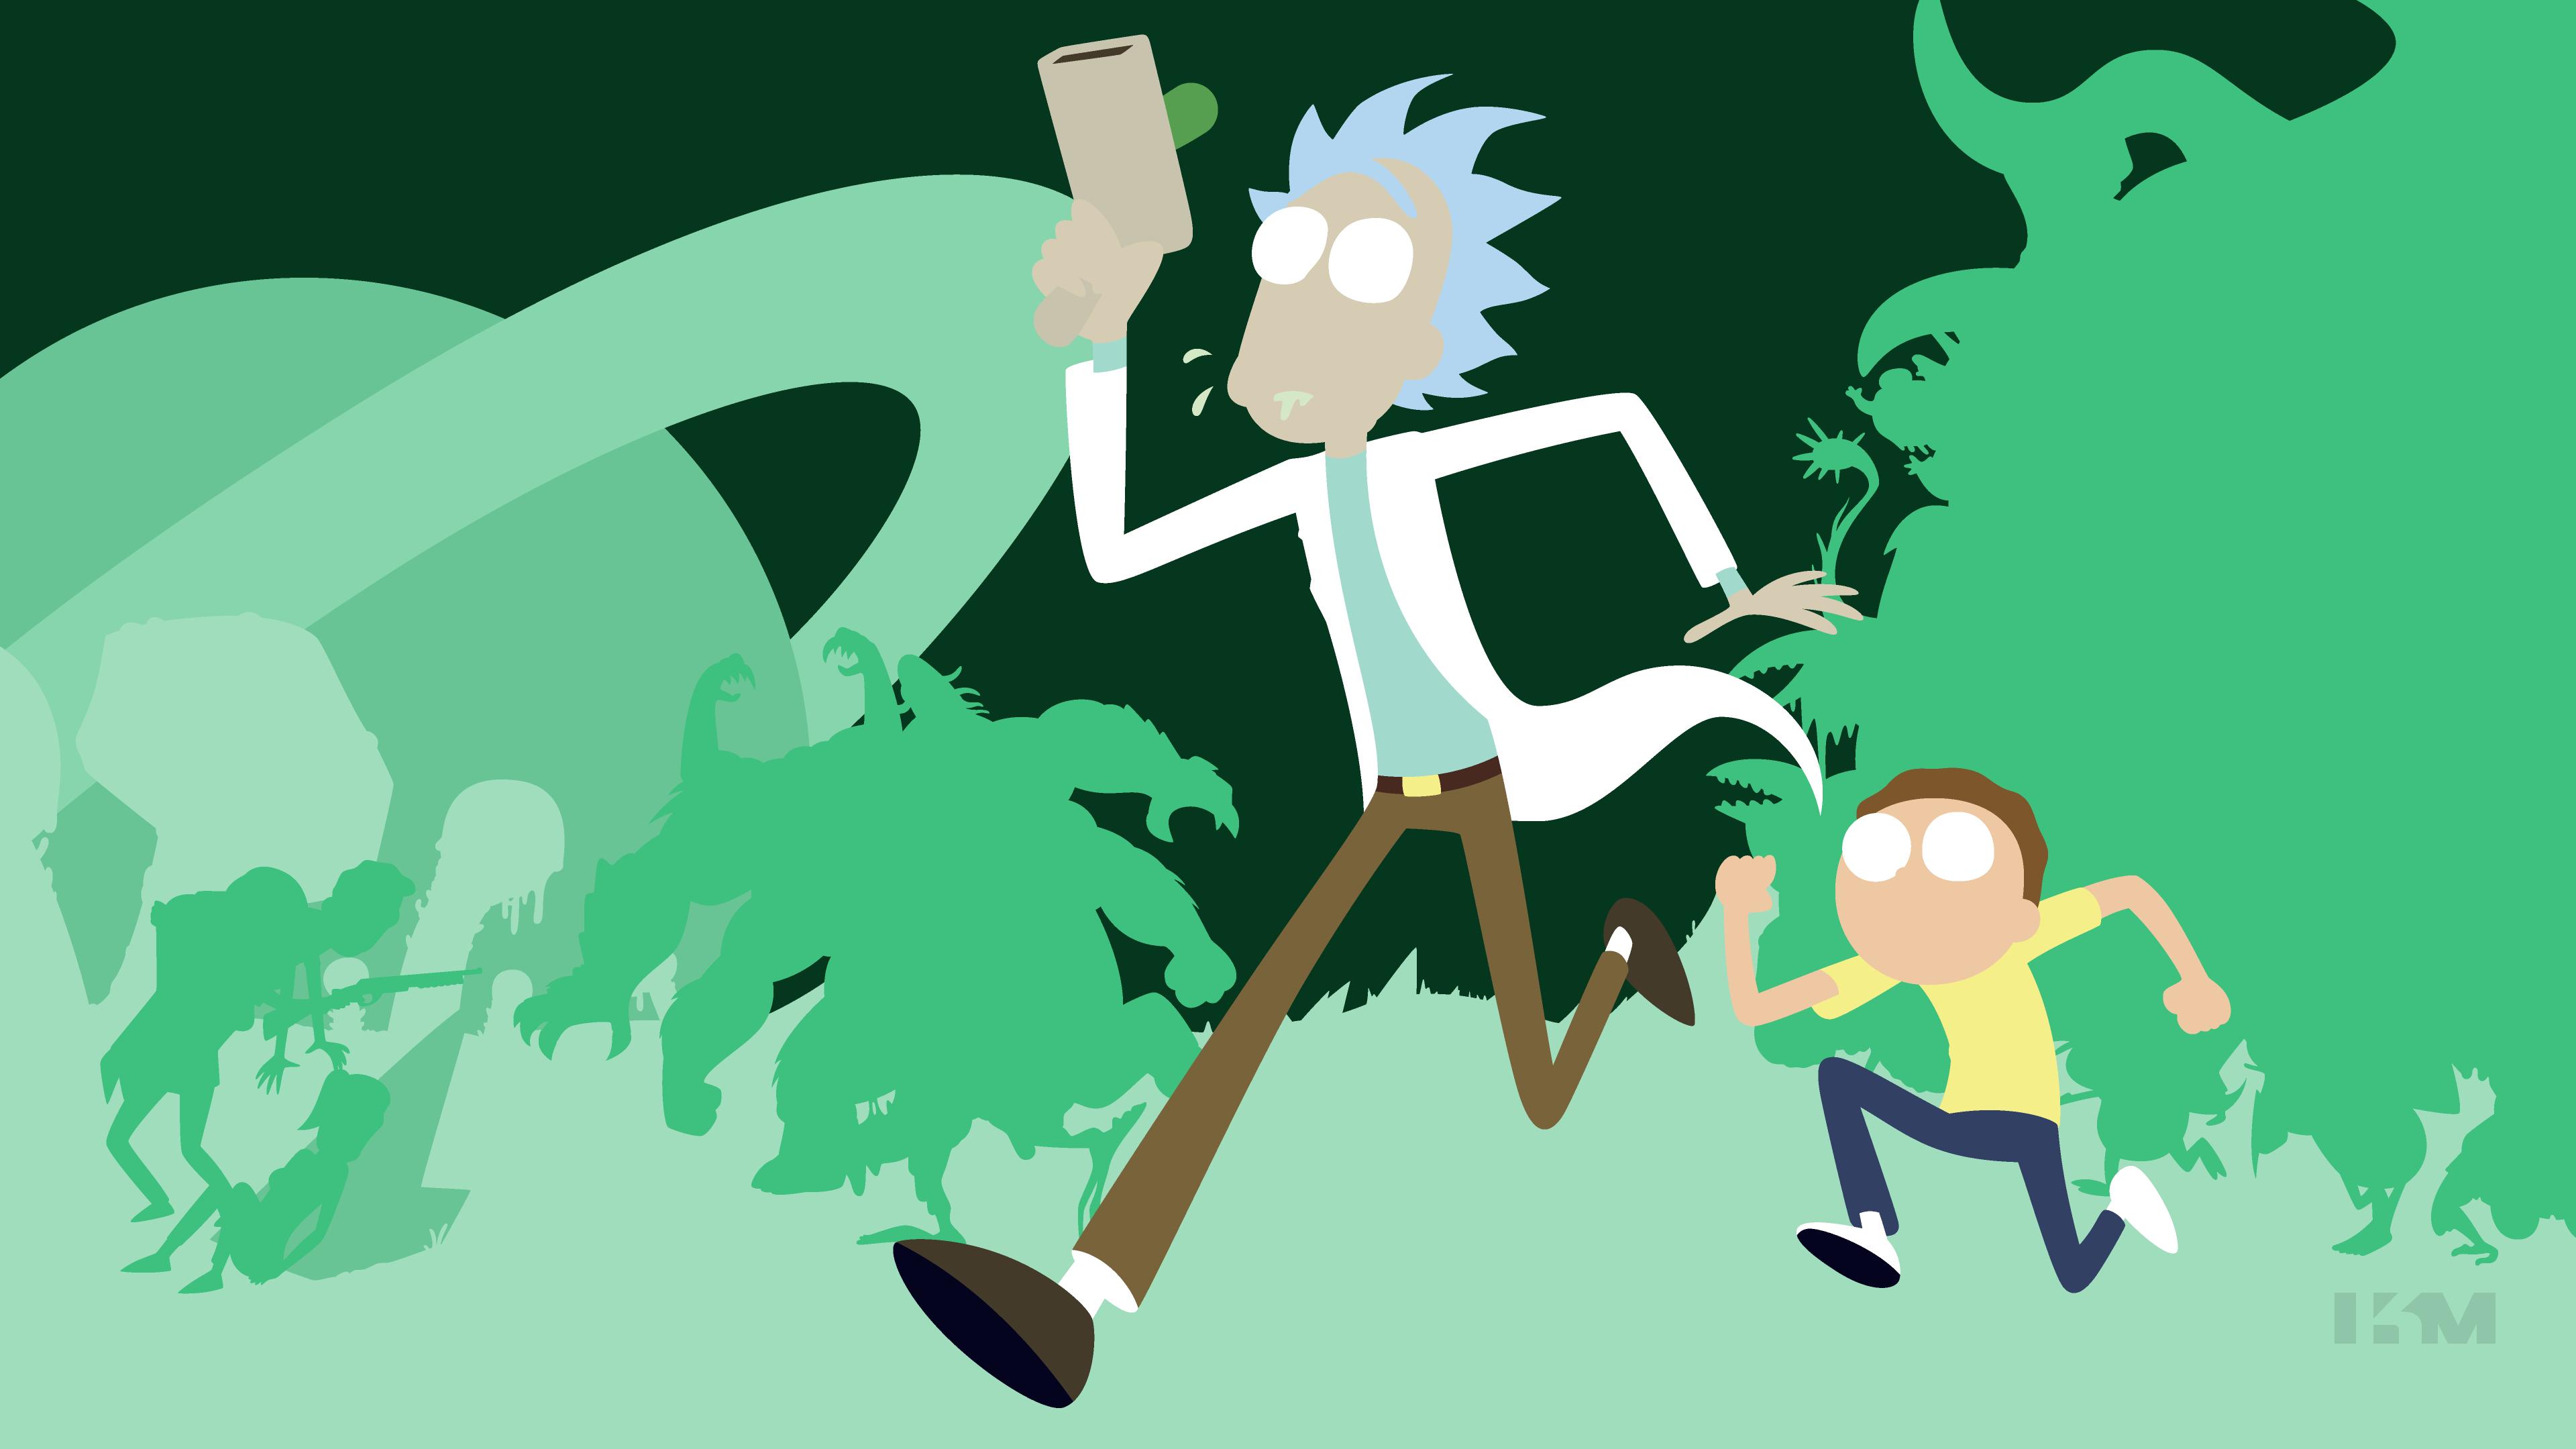 Rick And Morty By Krukmeister On Deviantart